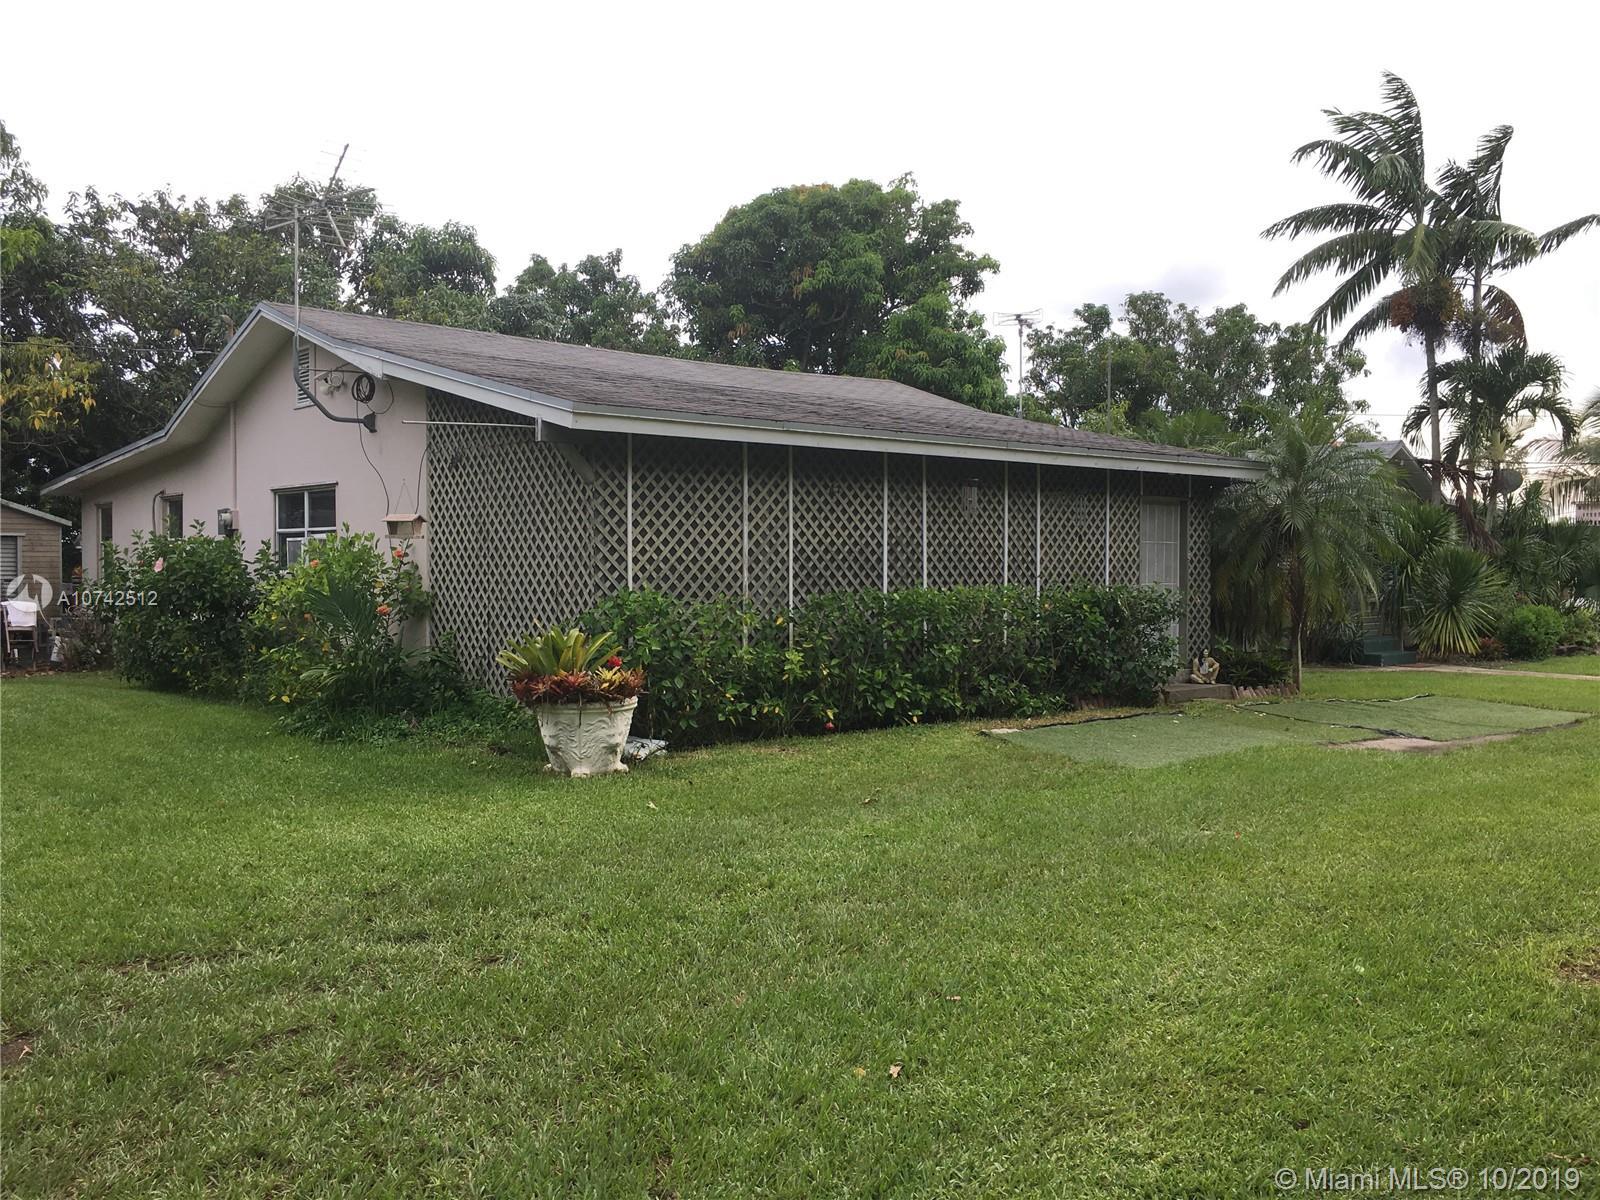 19900 SW 264th ST, Homestead, FL 33031 - Homestead, FL real estate listing